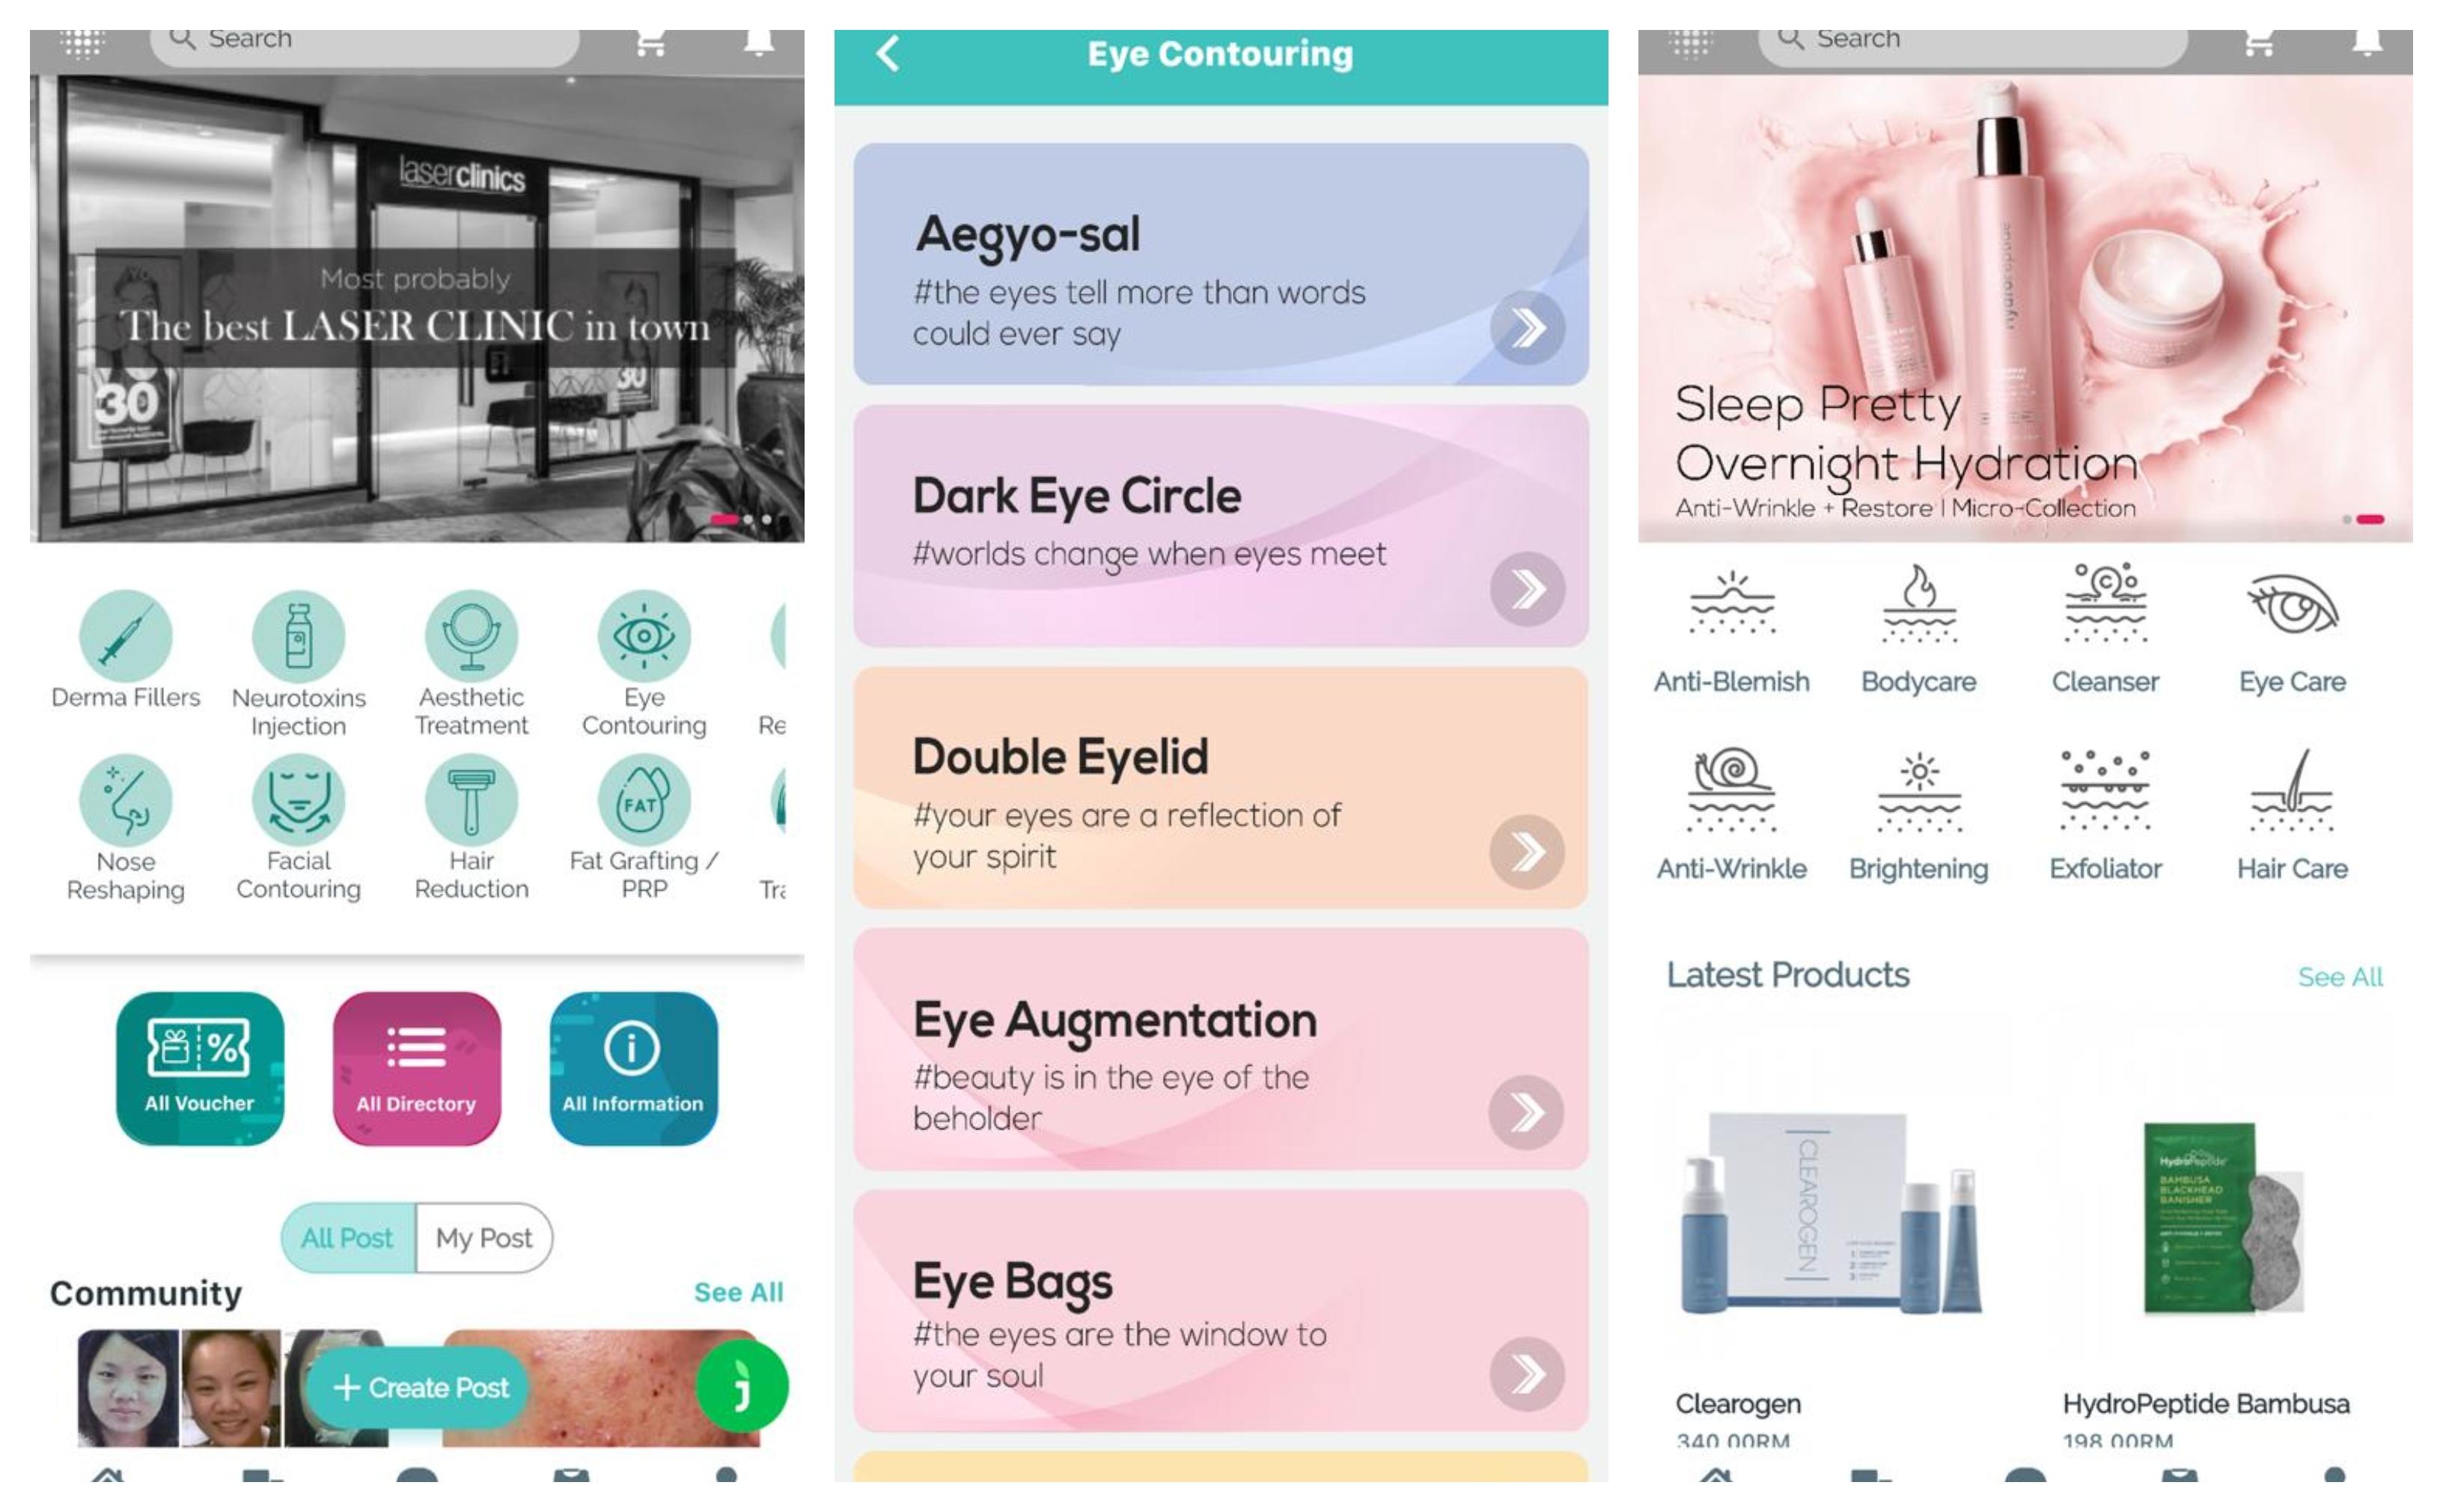 NextBeu手机应用程序就是像美容百科全书,能提供美容行业的广泛信息-Cosderm 私人有限公司提供-